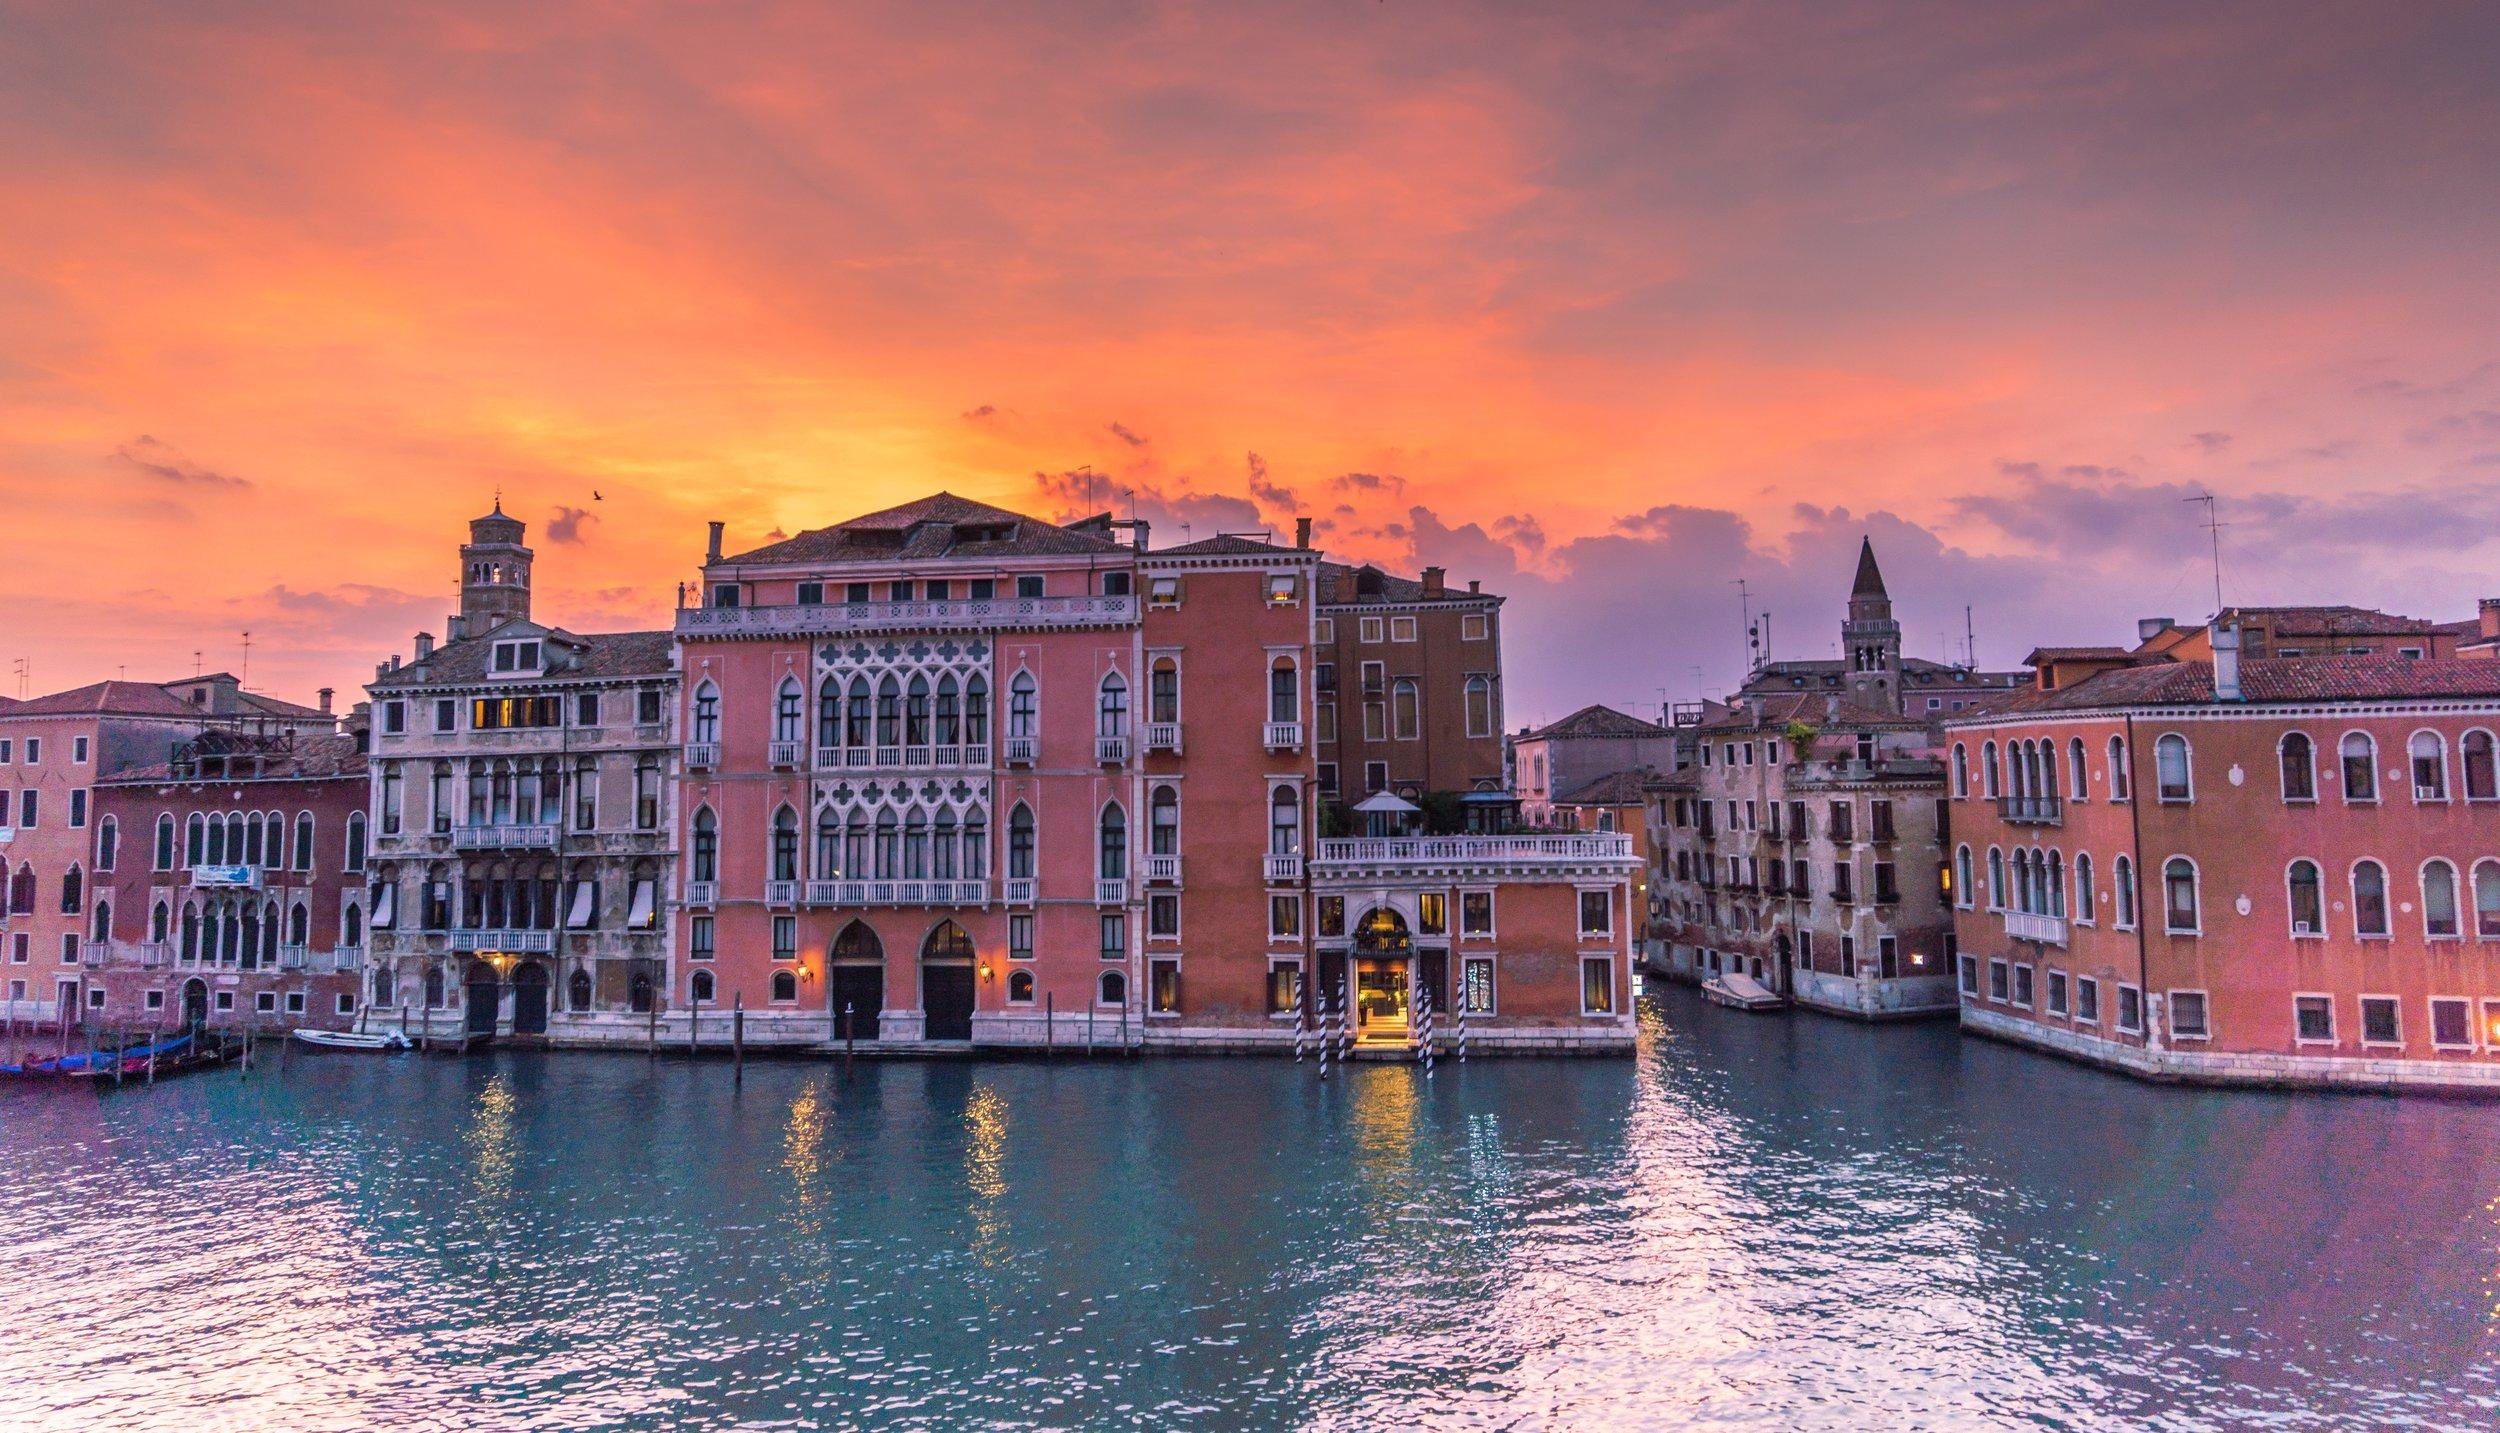 venice-italy-sunset-grand-canal-158441.jpeg